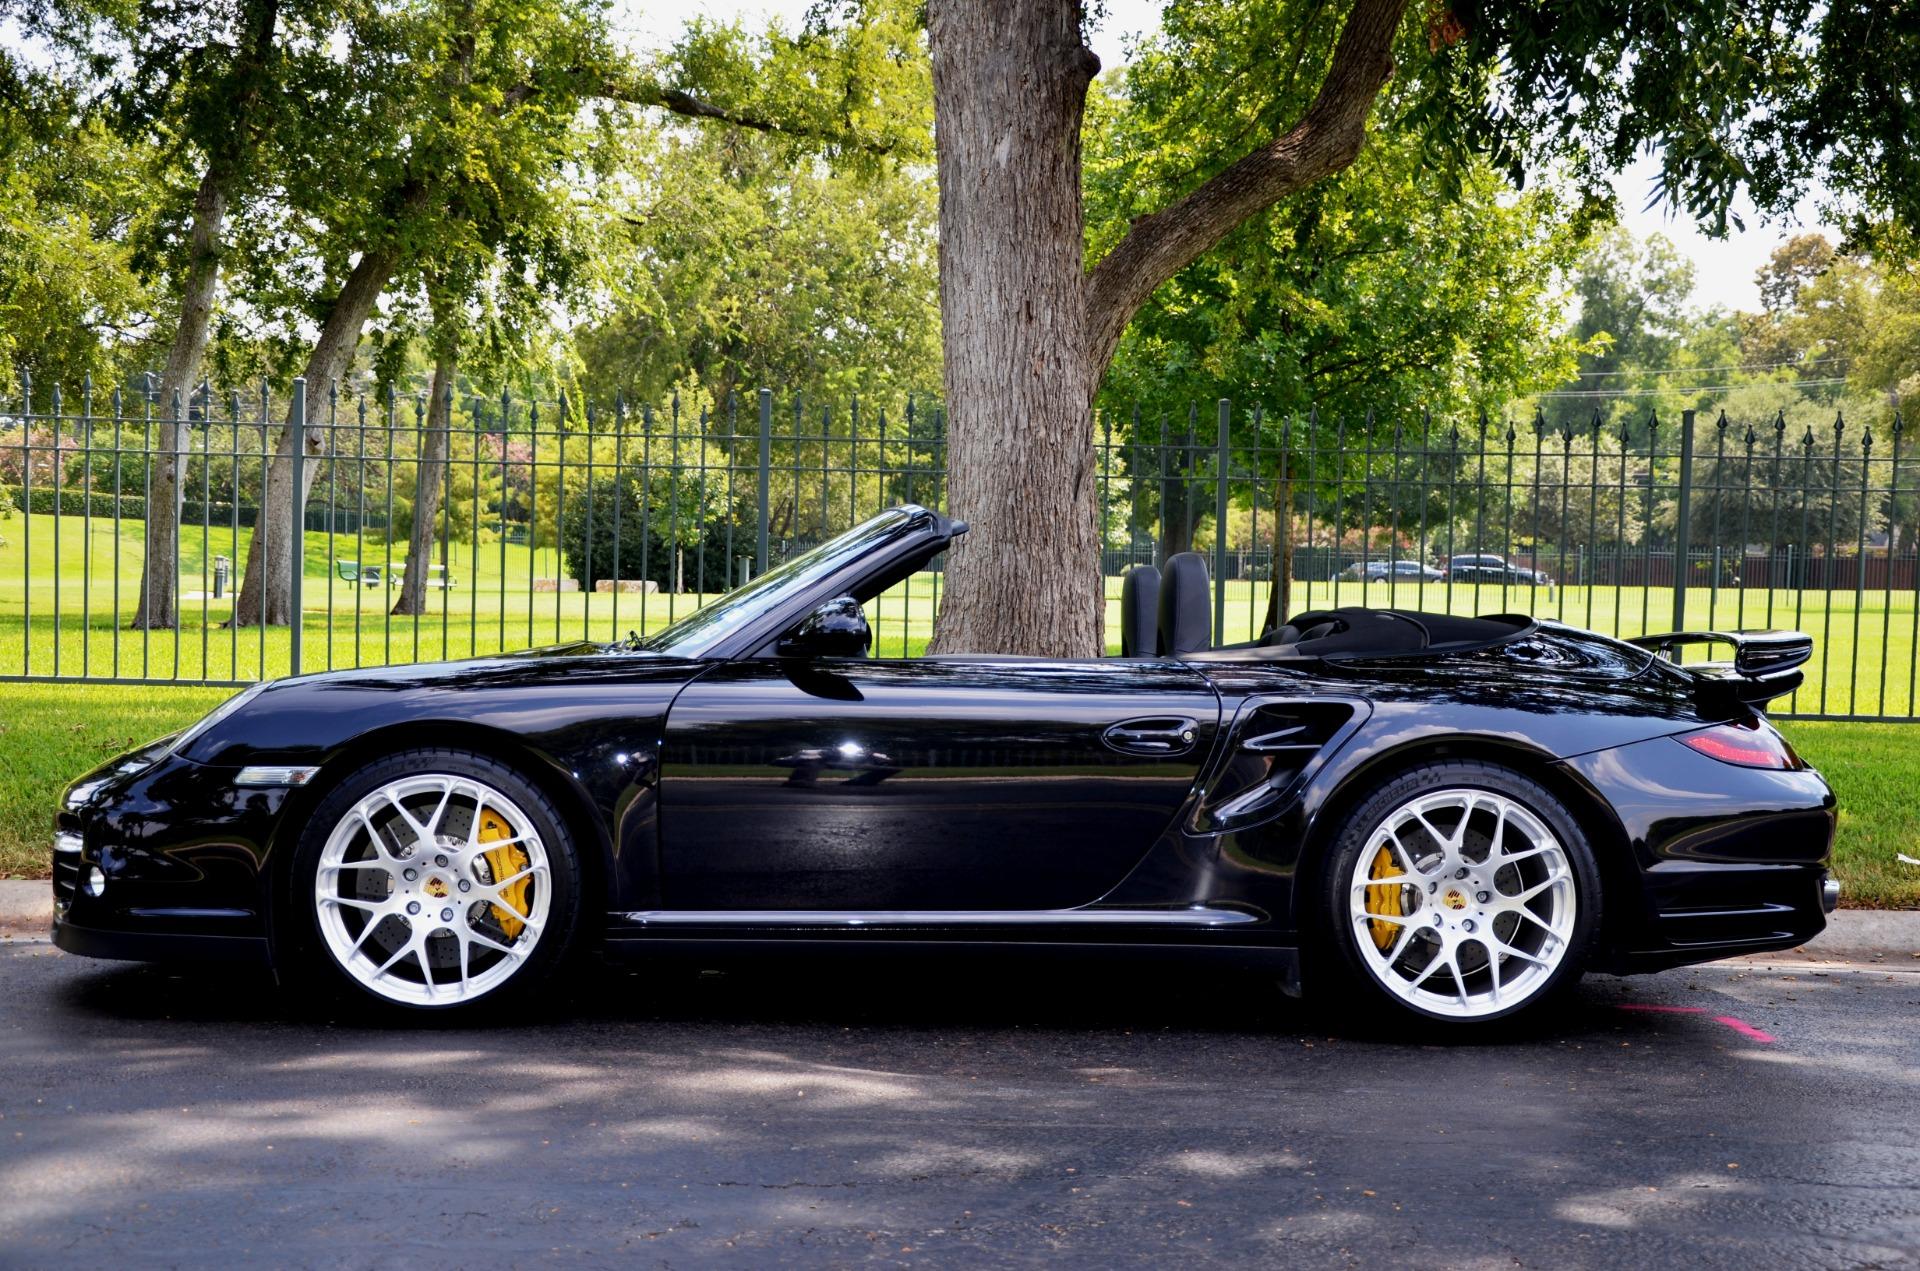 2015 porsche 911 turbo s stock 15turbo for sale near. Black Bedroom Furniture Sets. Home Design Ideas